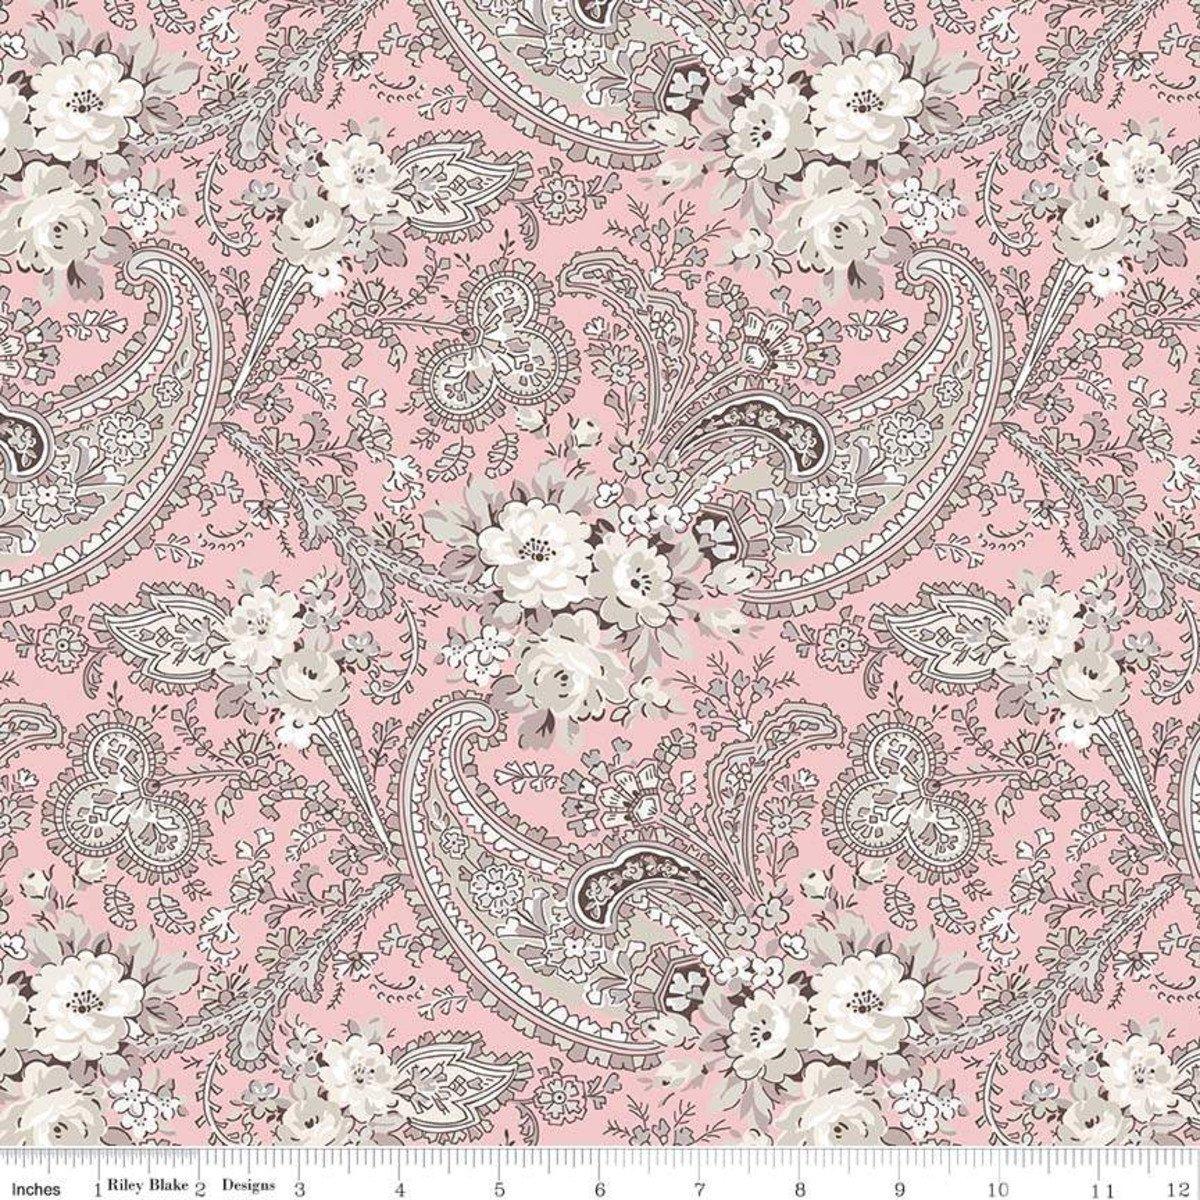 C7681-PINK_Paisley Rose Garden